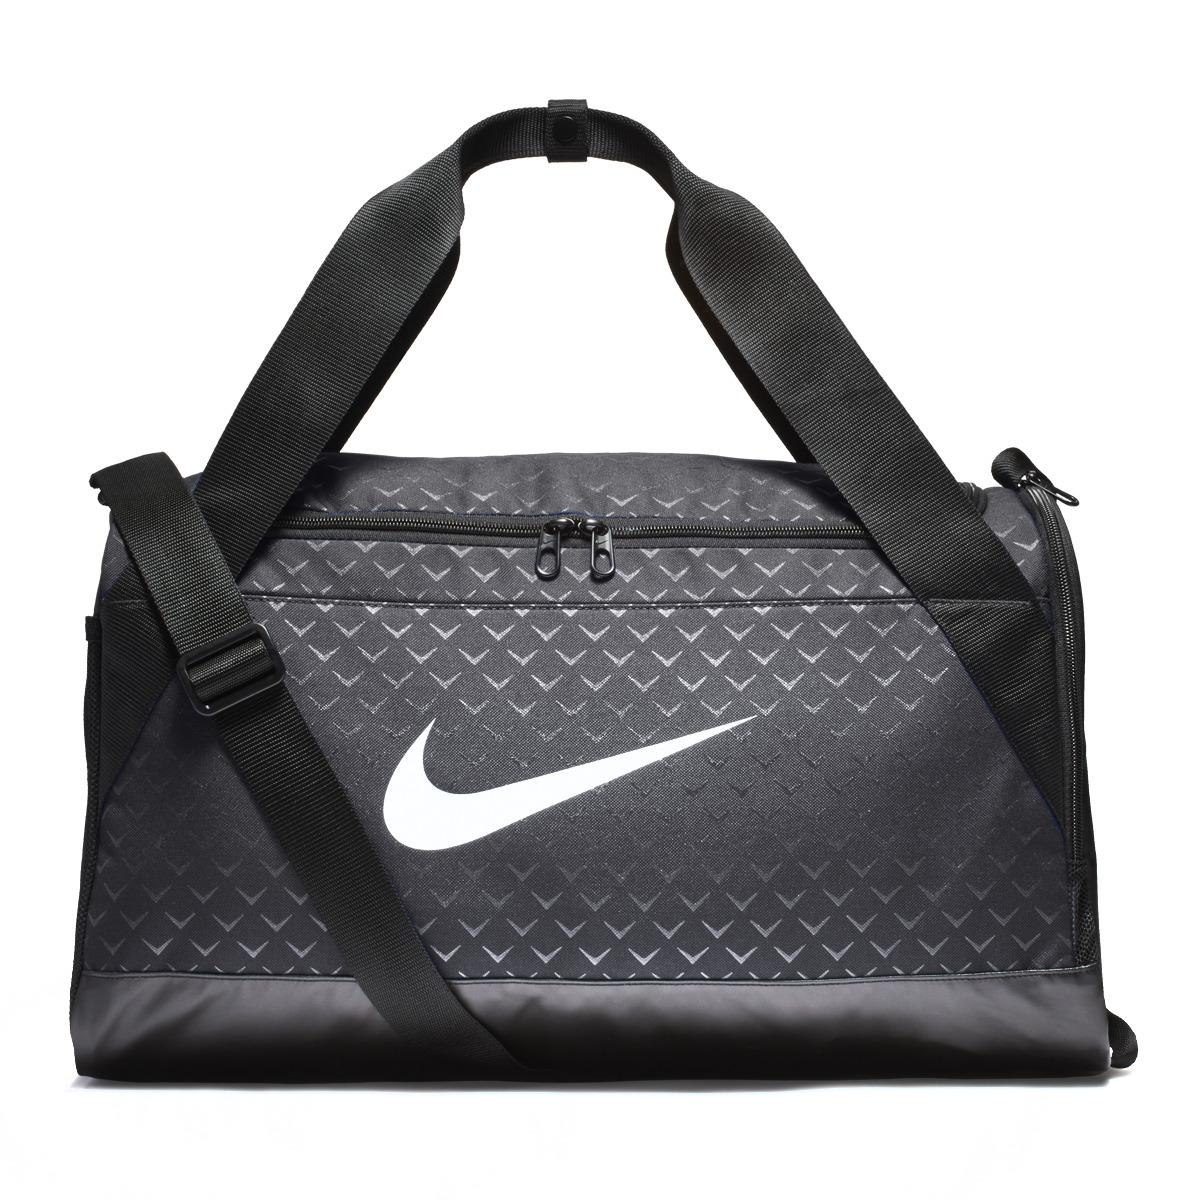 e7c126c7e2 Lyst - Nike Brasilia (small) Sports Bag in Gray for Men